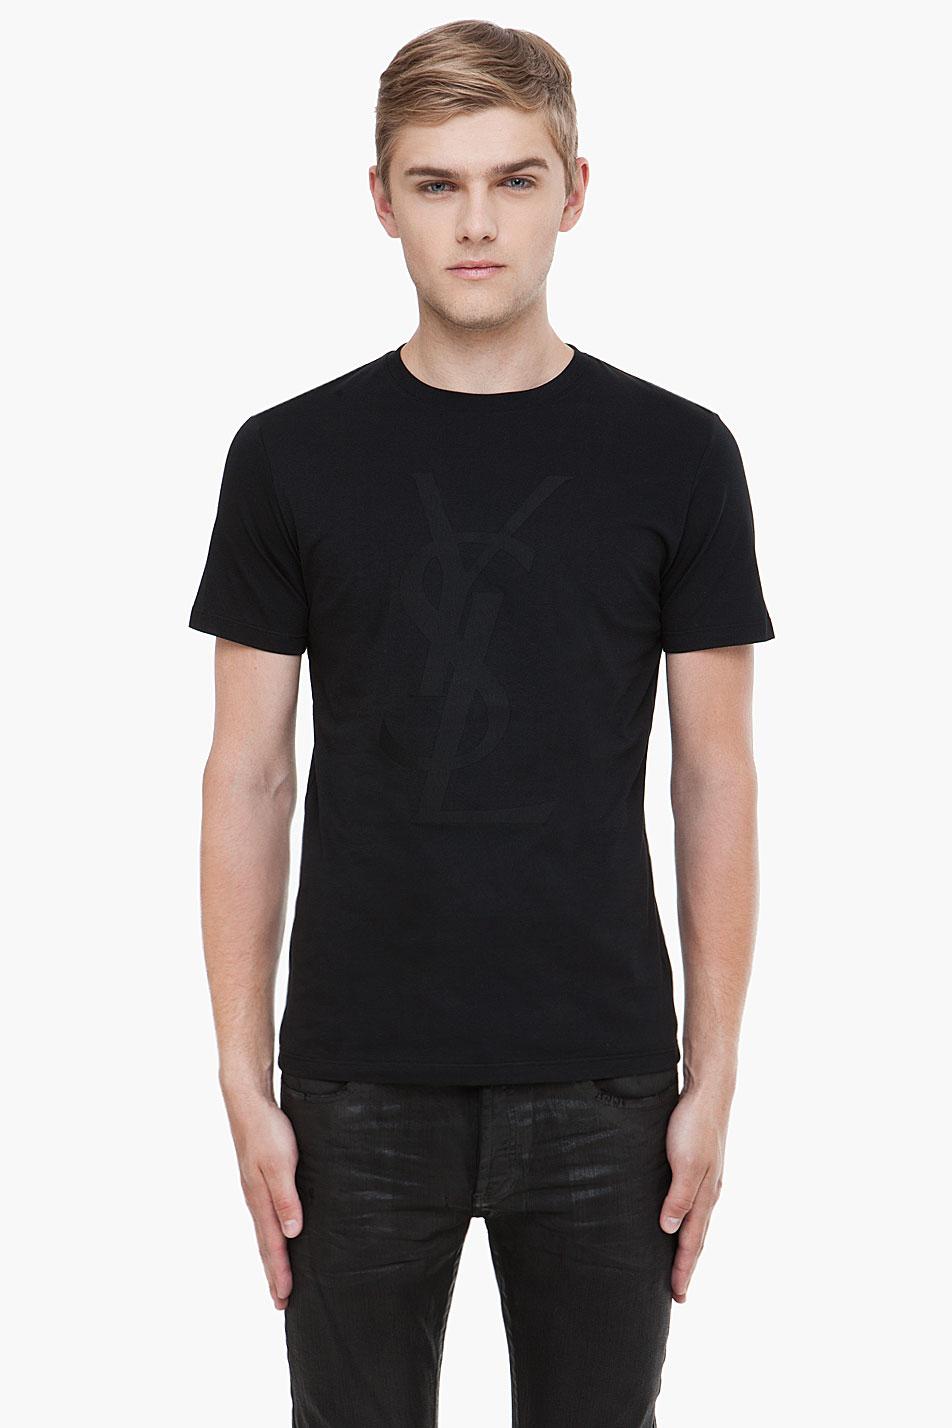 Saint laurent black logo print tshirt in black for men lyst for Yves saint laurent logo shirt